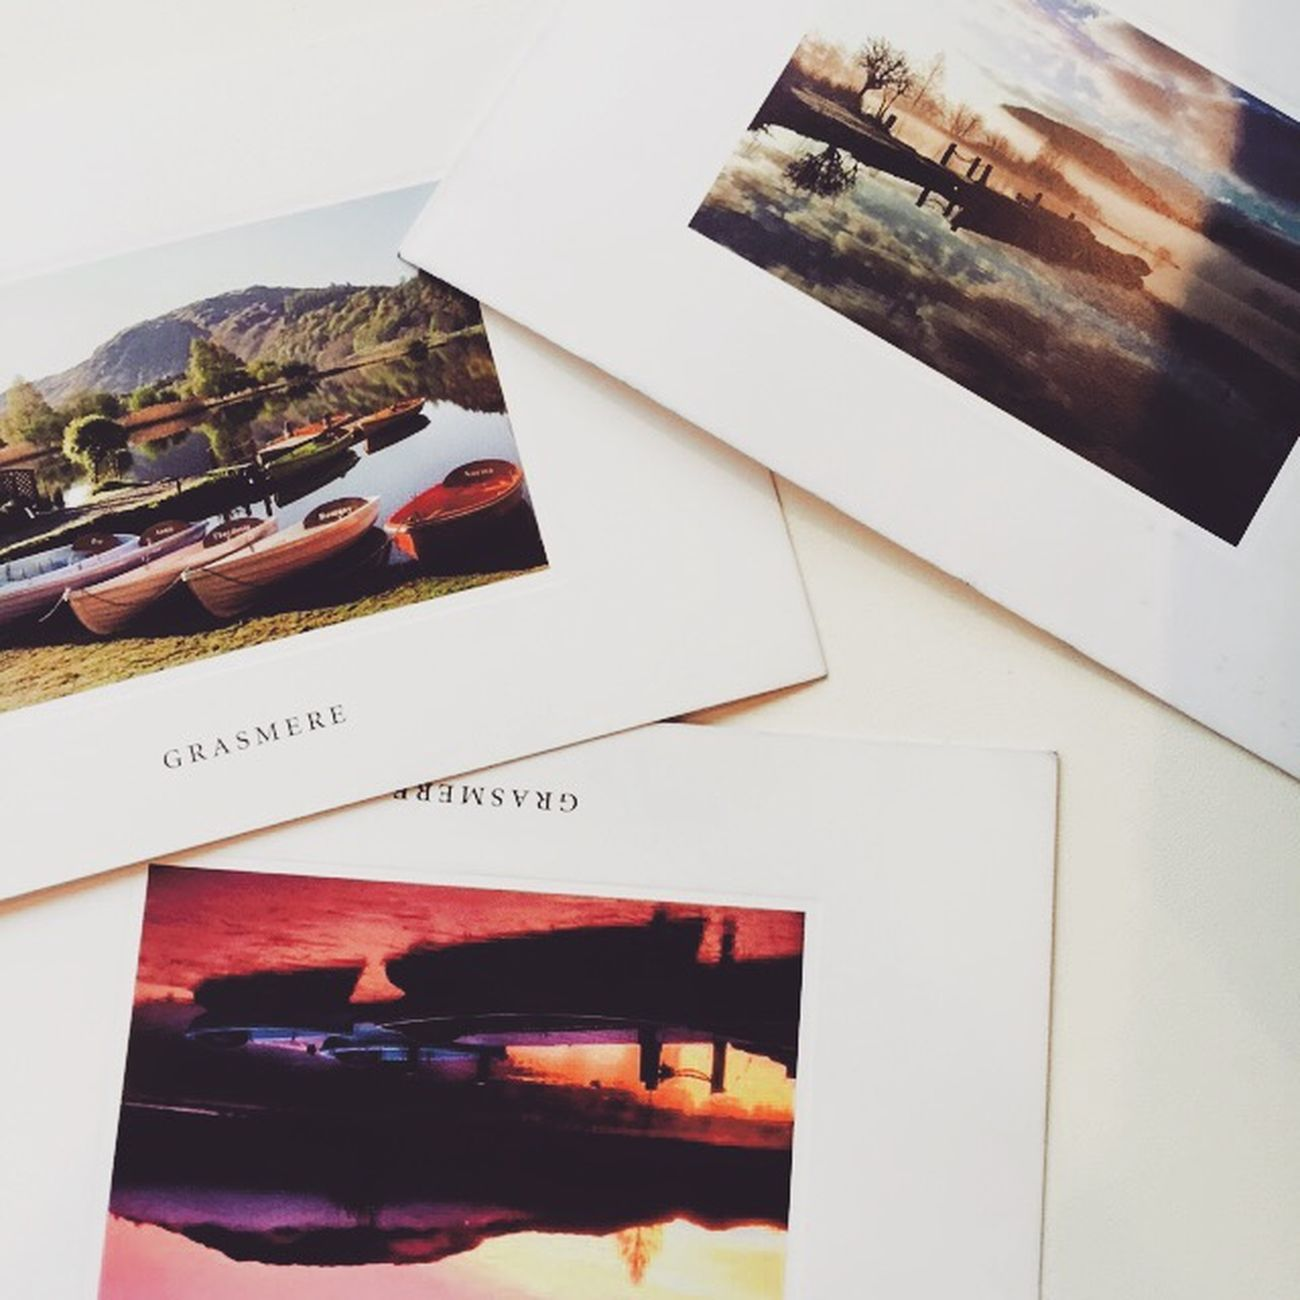 Postcards Imperfect Postcards Grasmere Scenary Truewords Formyfriends Lovelycard